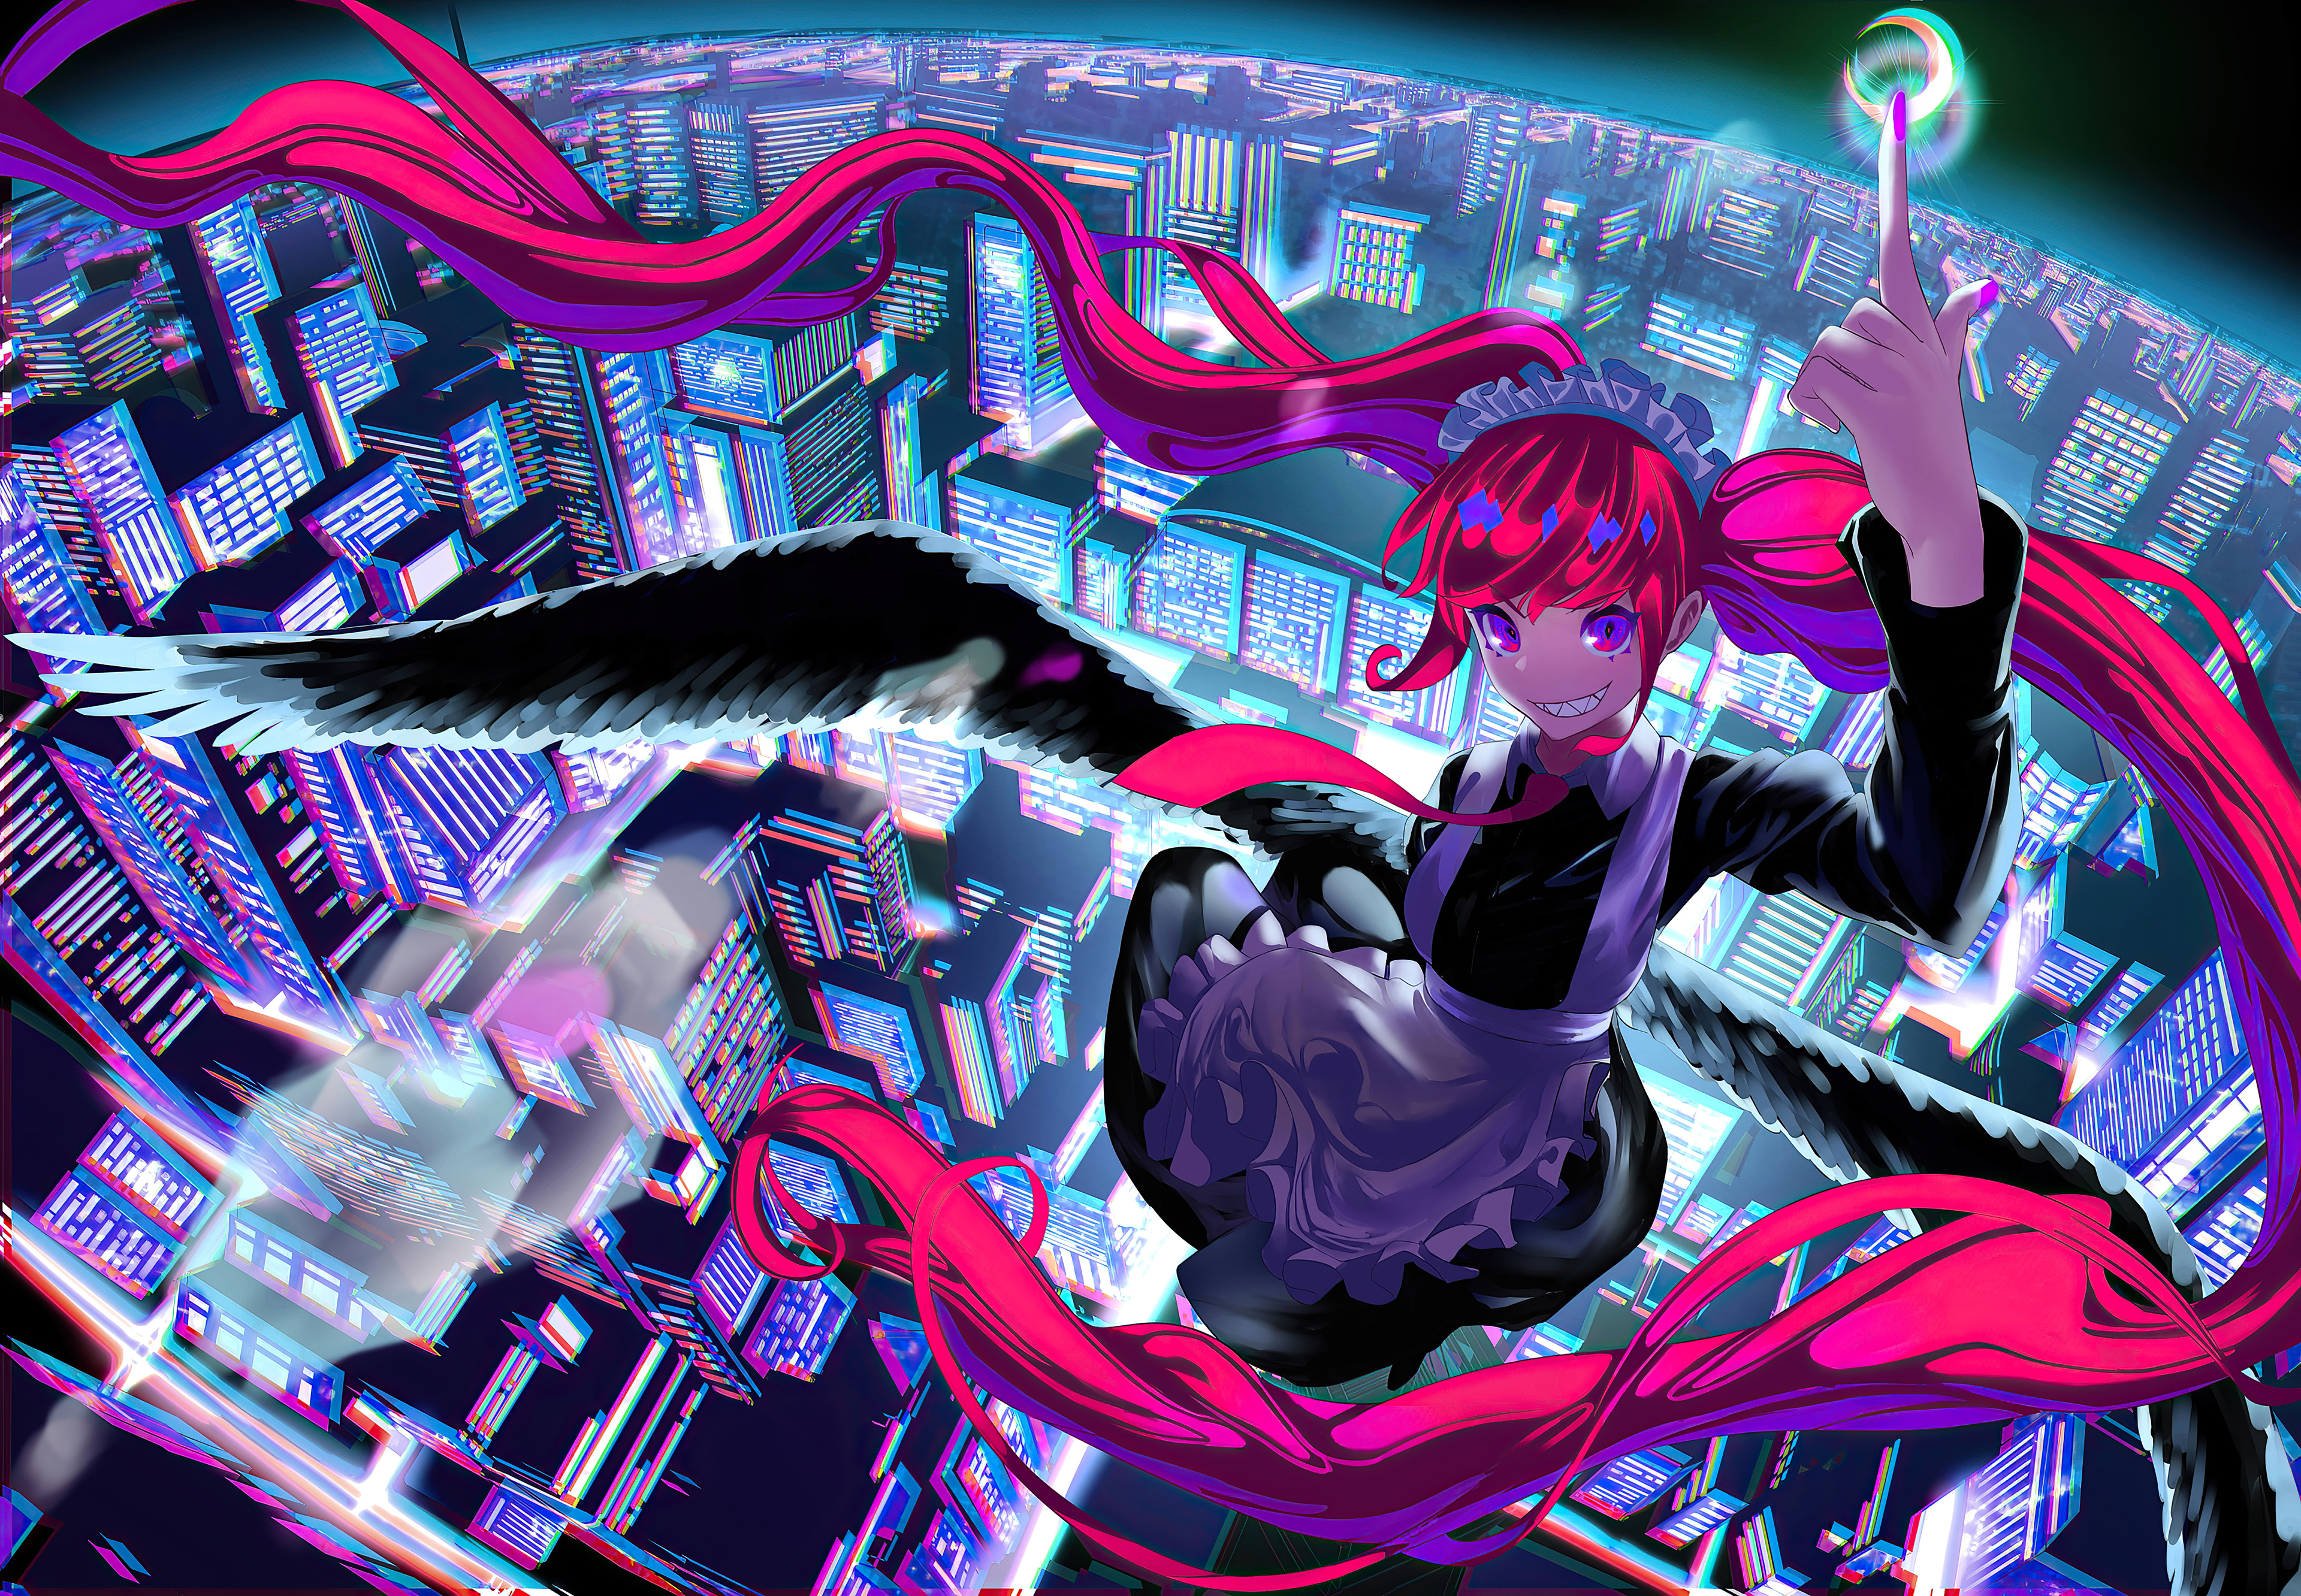 crazy heights anime girl 4k 1602437951 - Crazy Heights Anime Girl 4k - Crazy Heights Anime Girl 4k wallpapers